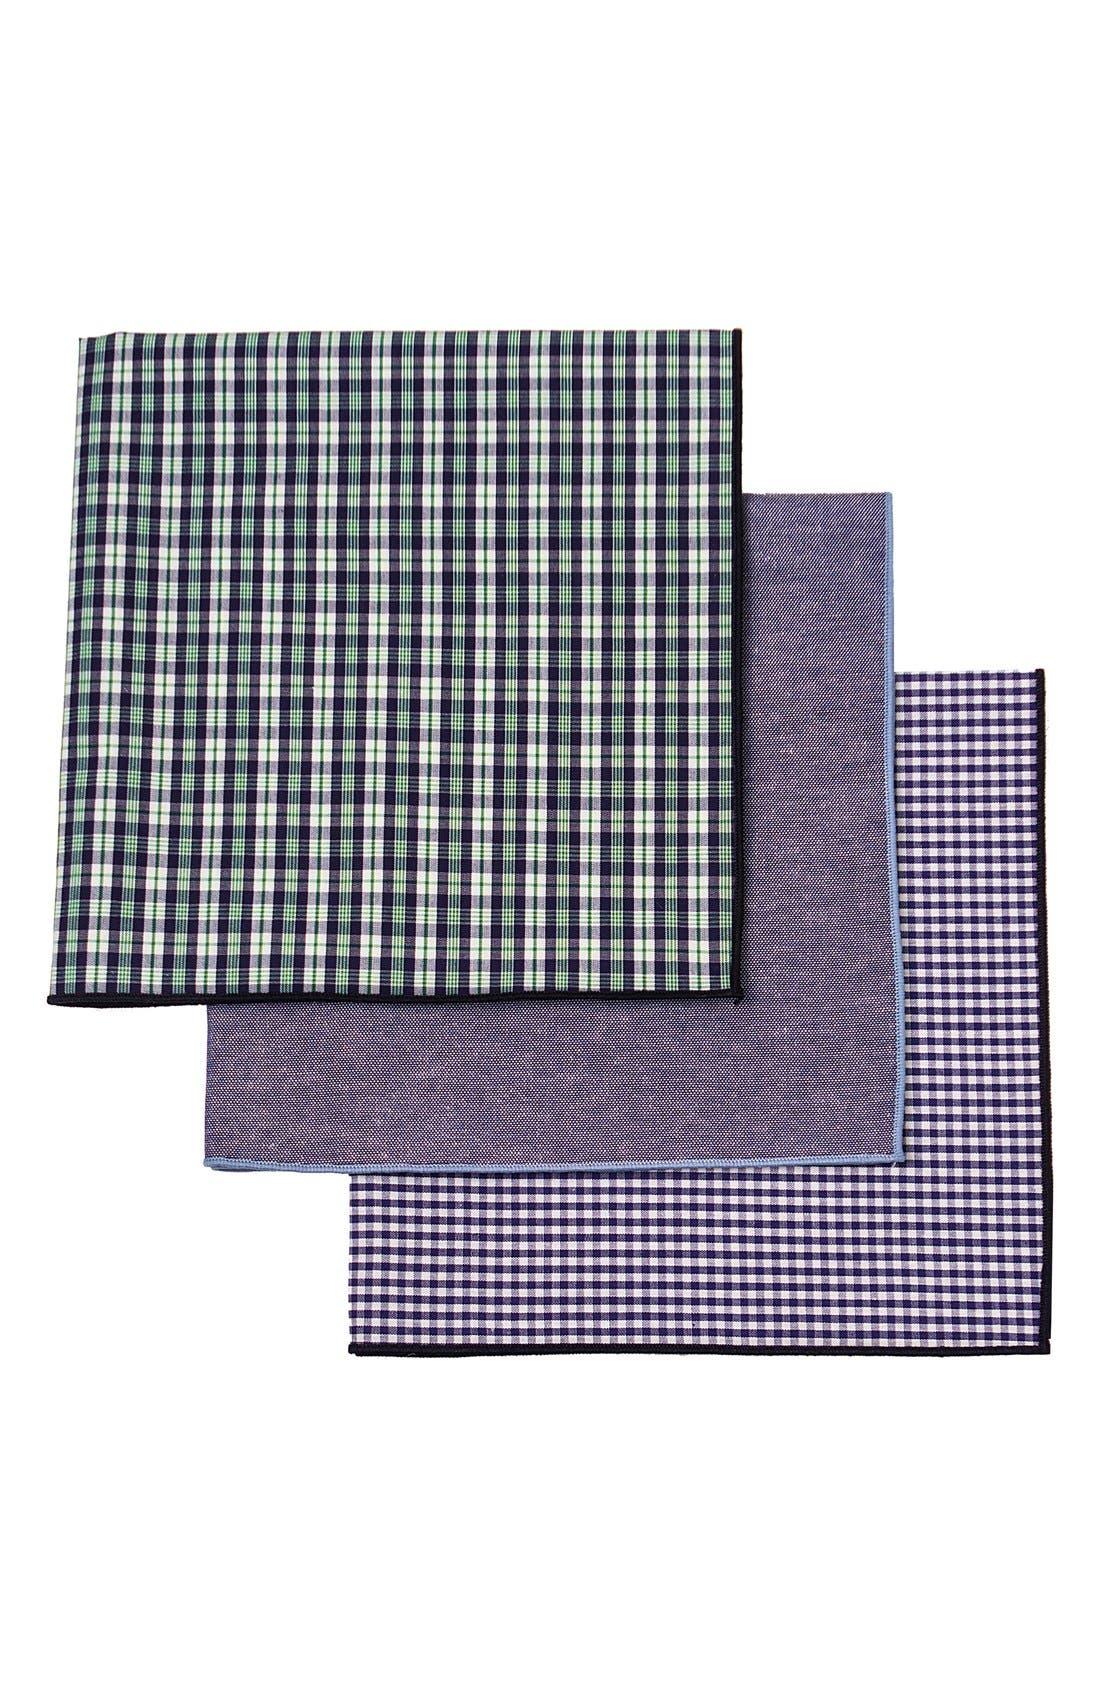 Set of 3 Monogram Pocket Squares,                             Main thumbnail 1, color,                             300